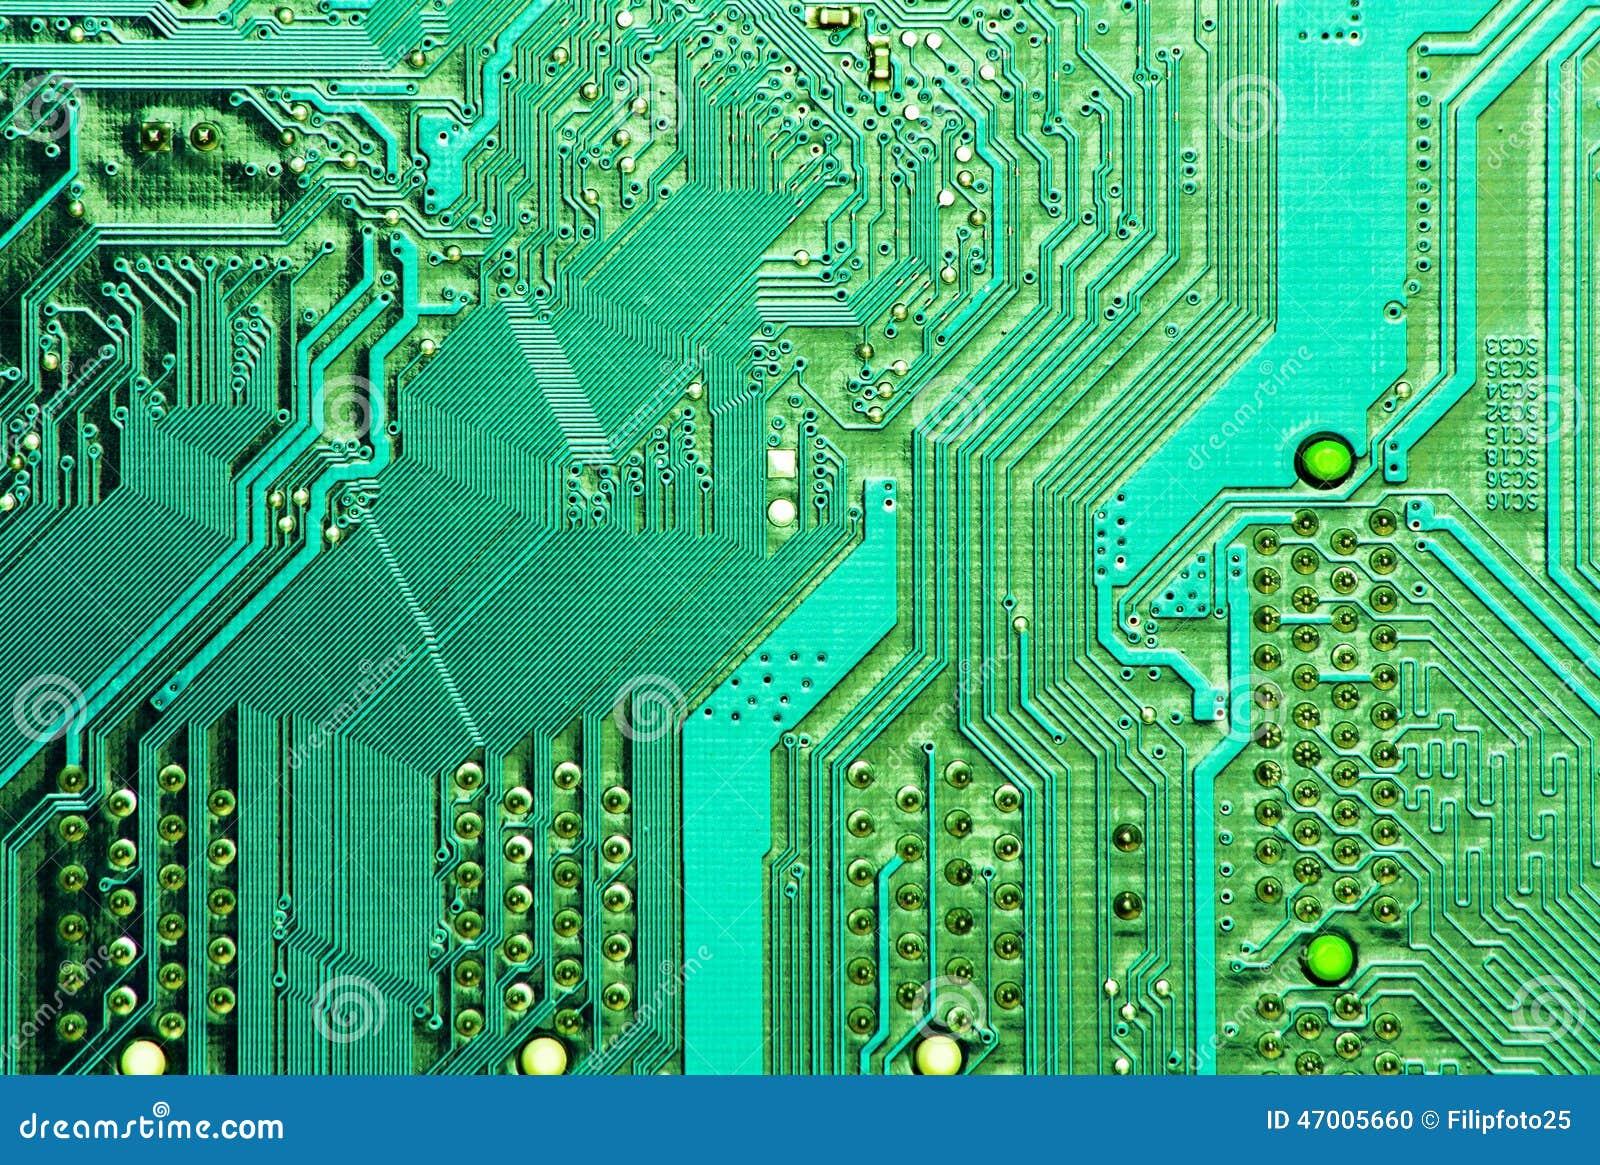 Msi Ms163m Motherboard Schematic Circuit Diagram